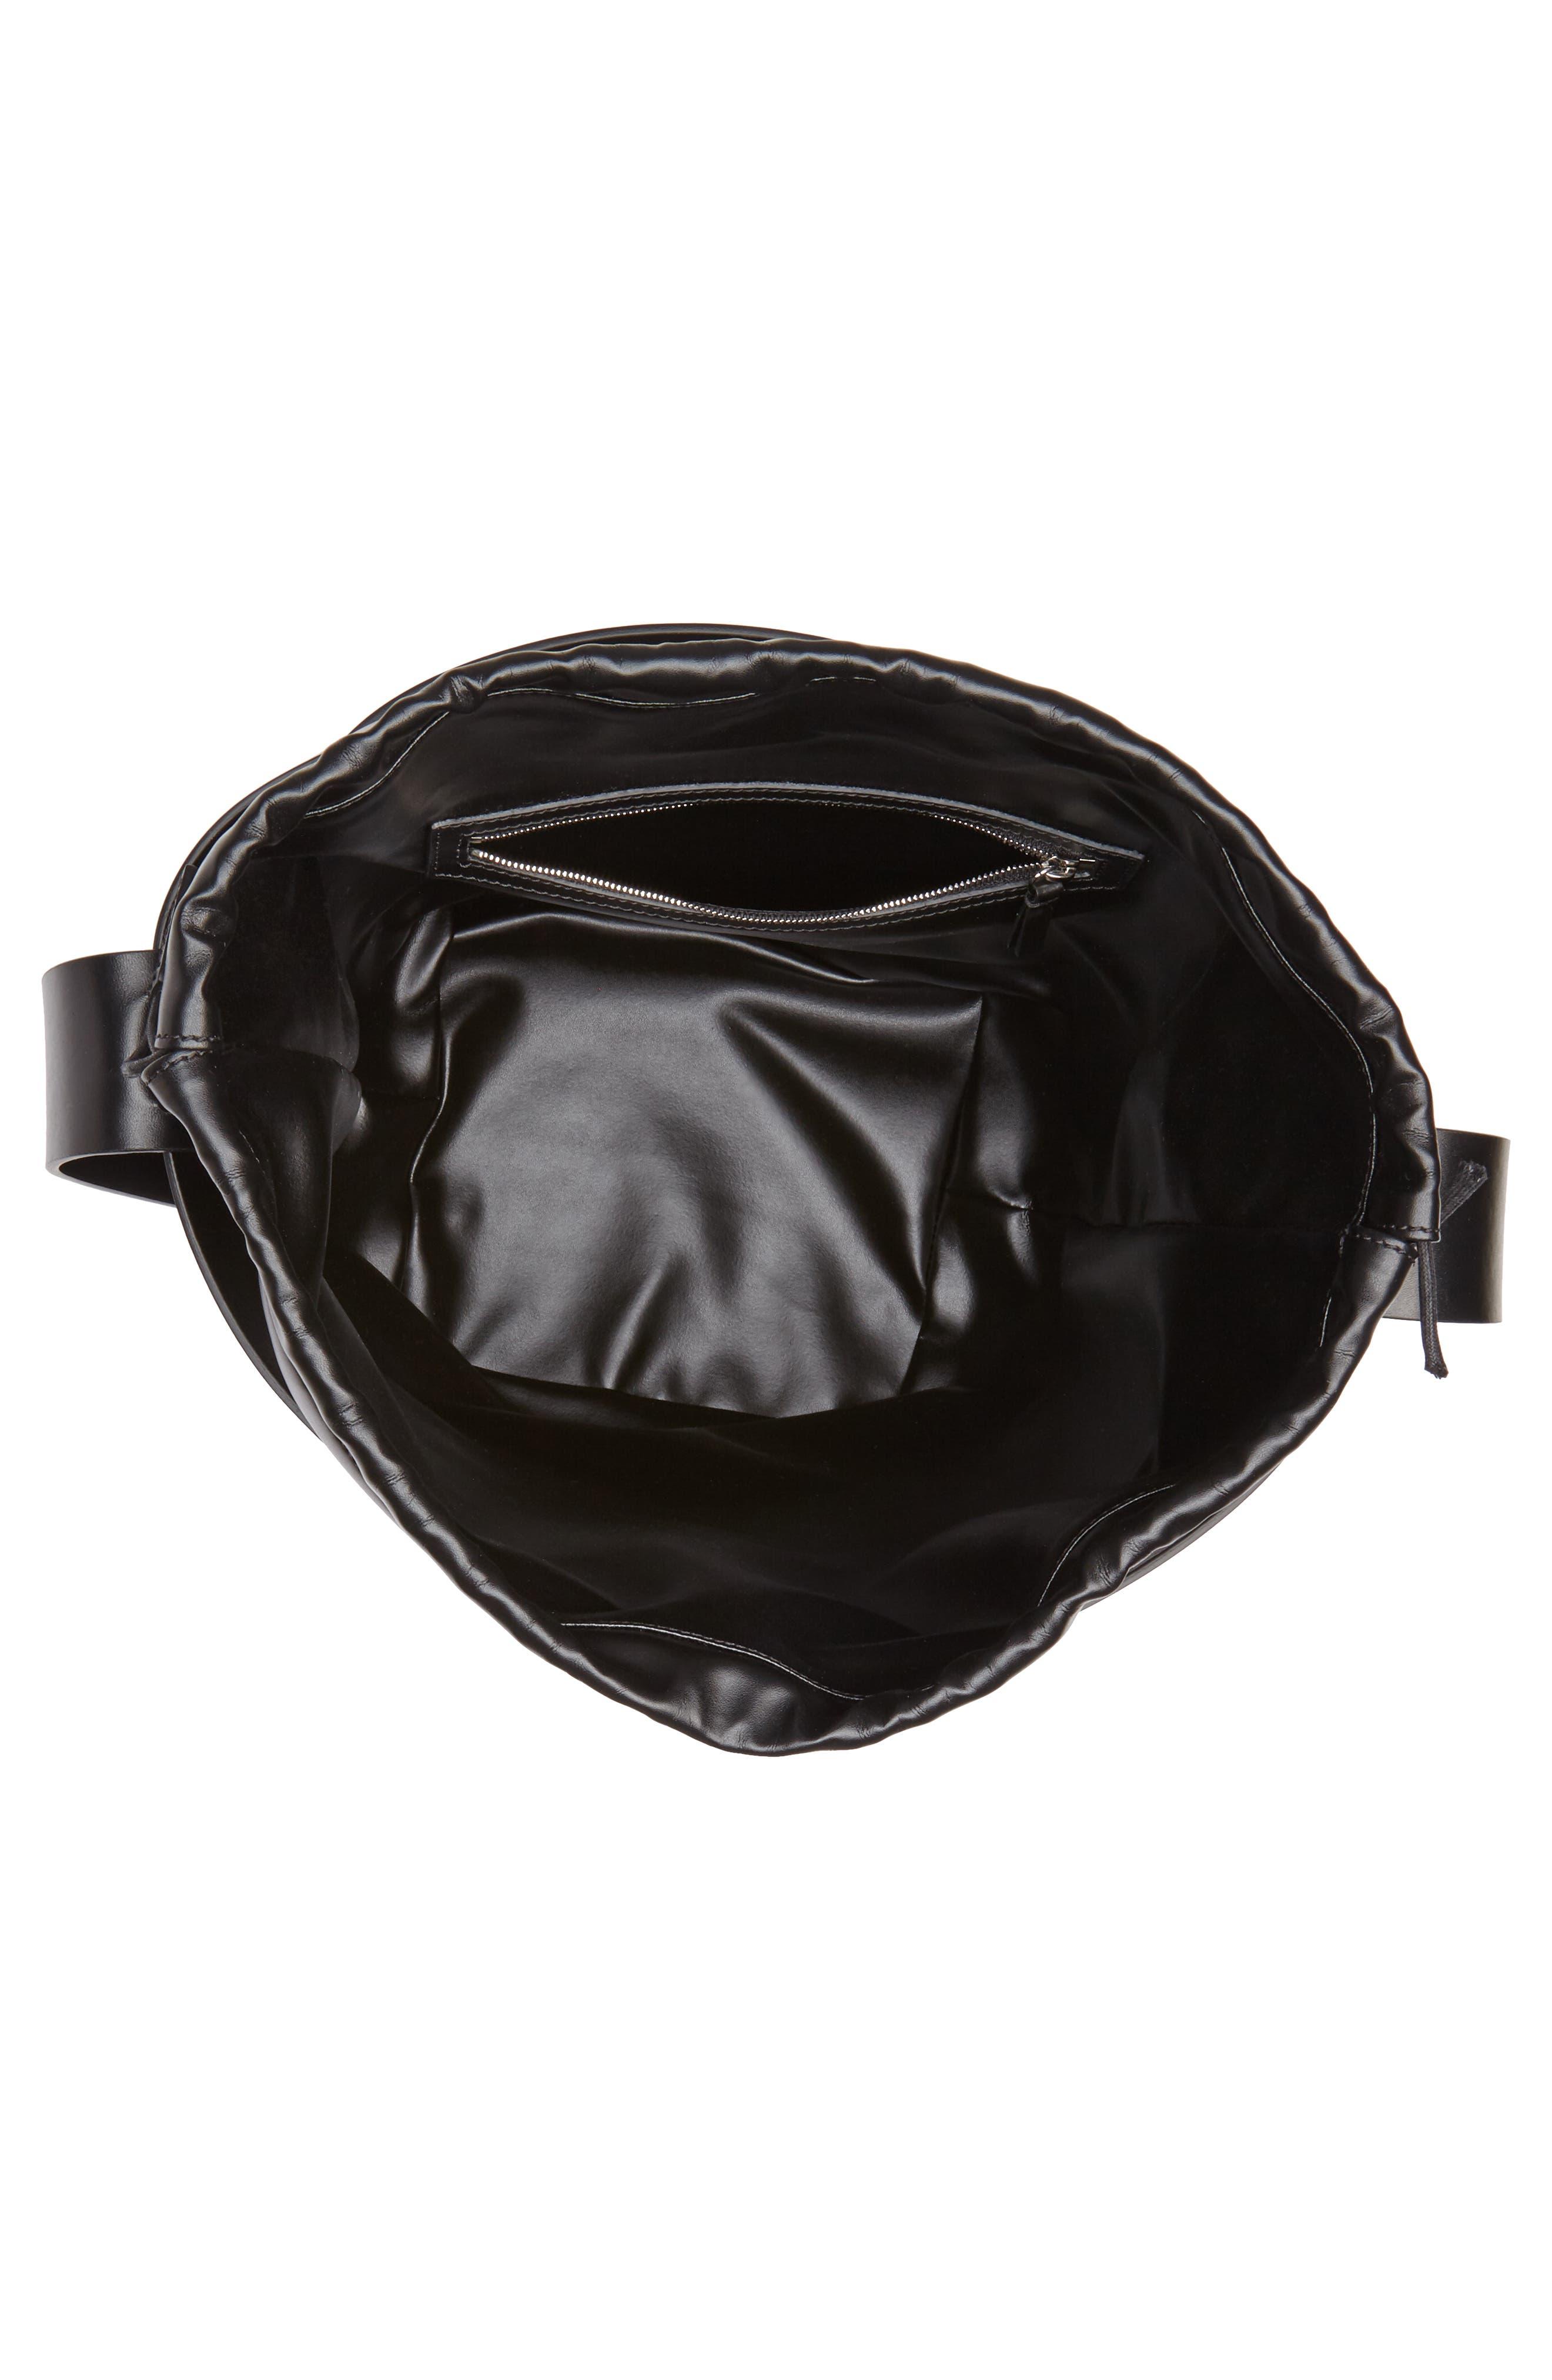 Medium Cage Leather Bucket Bag,                             Alternate thumbnail 4, color,                             001